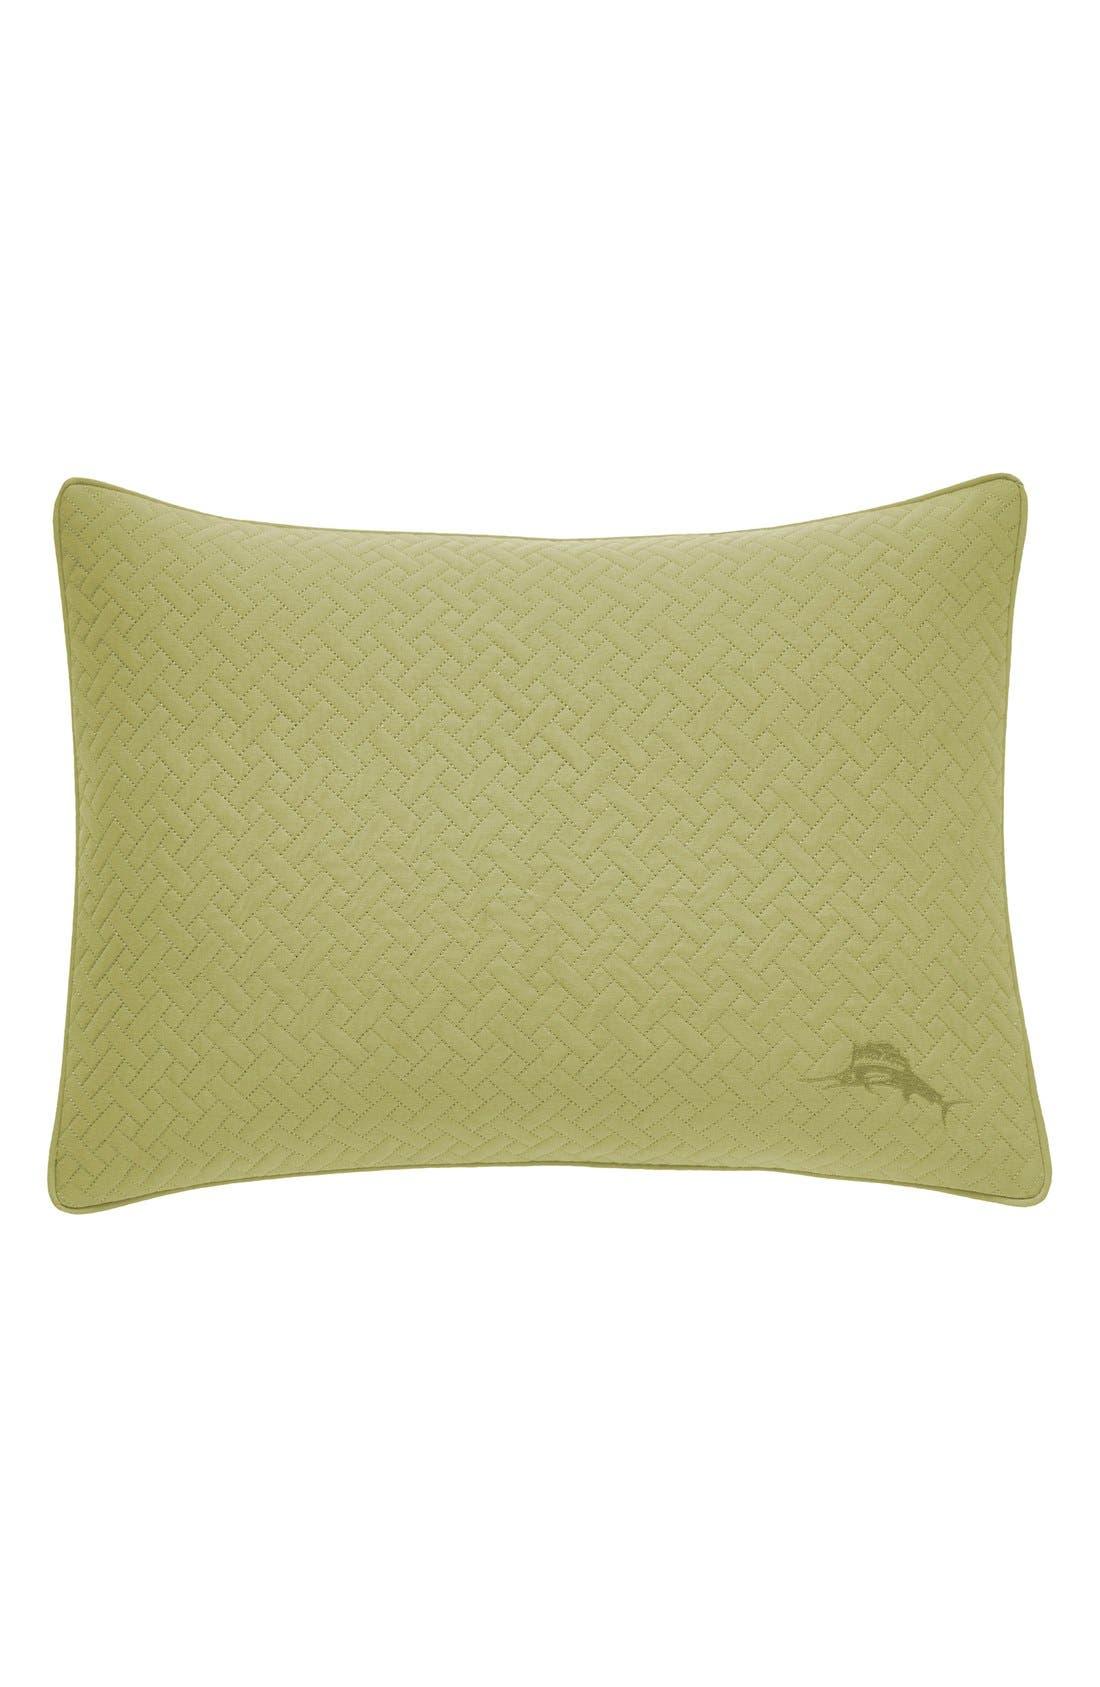 Main Image - Tommy Bahama 'Kiwi' Pillow